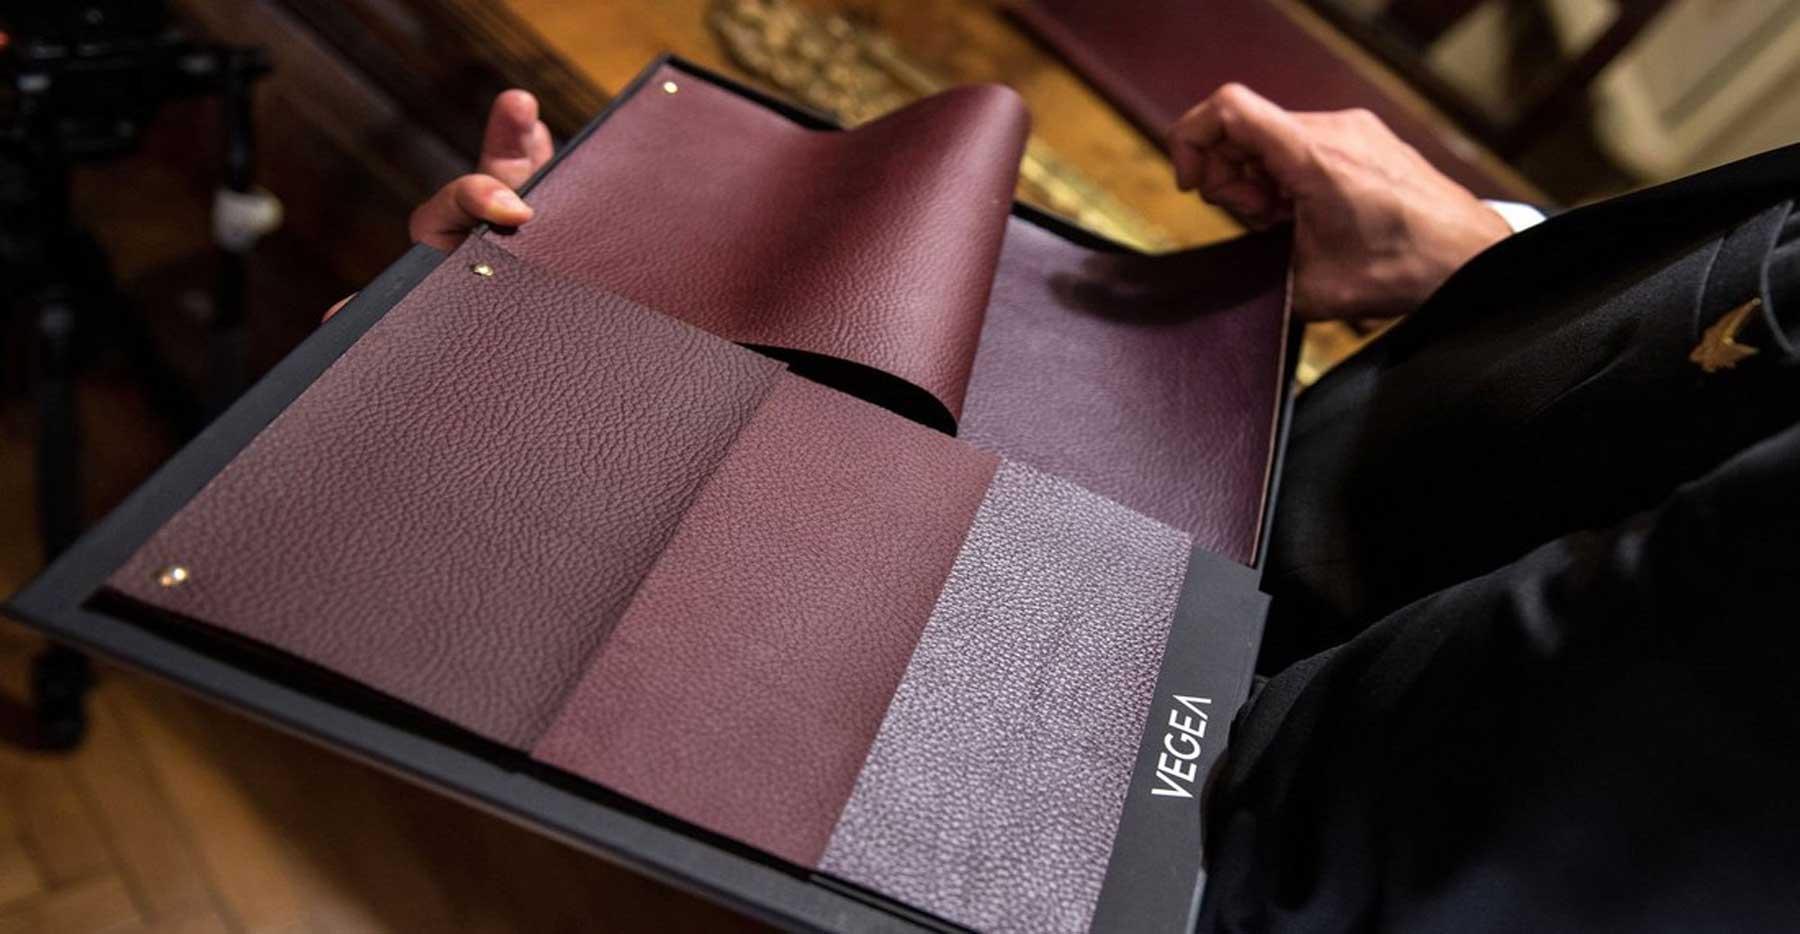 کیف مناسب وگان ها - چرم مصنوعی